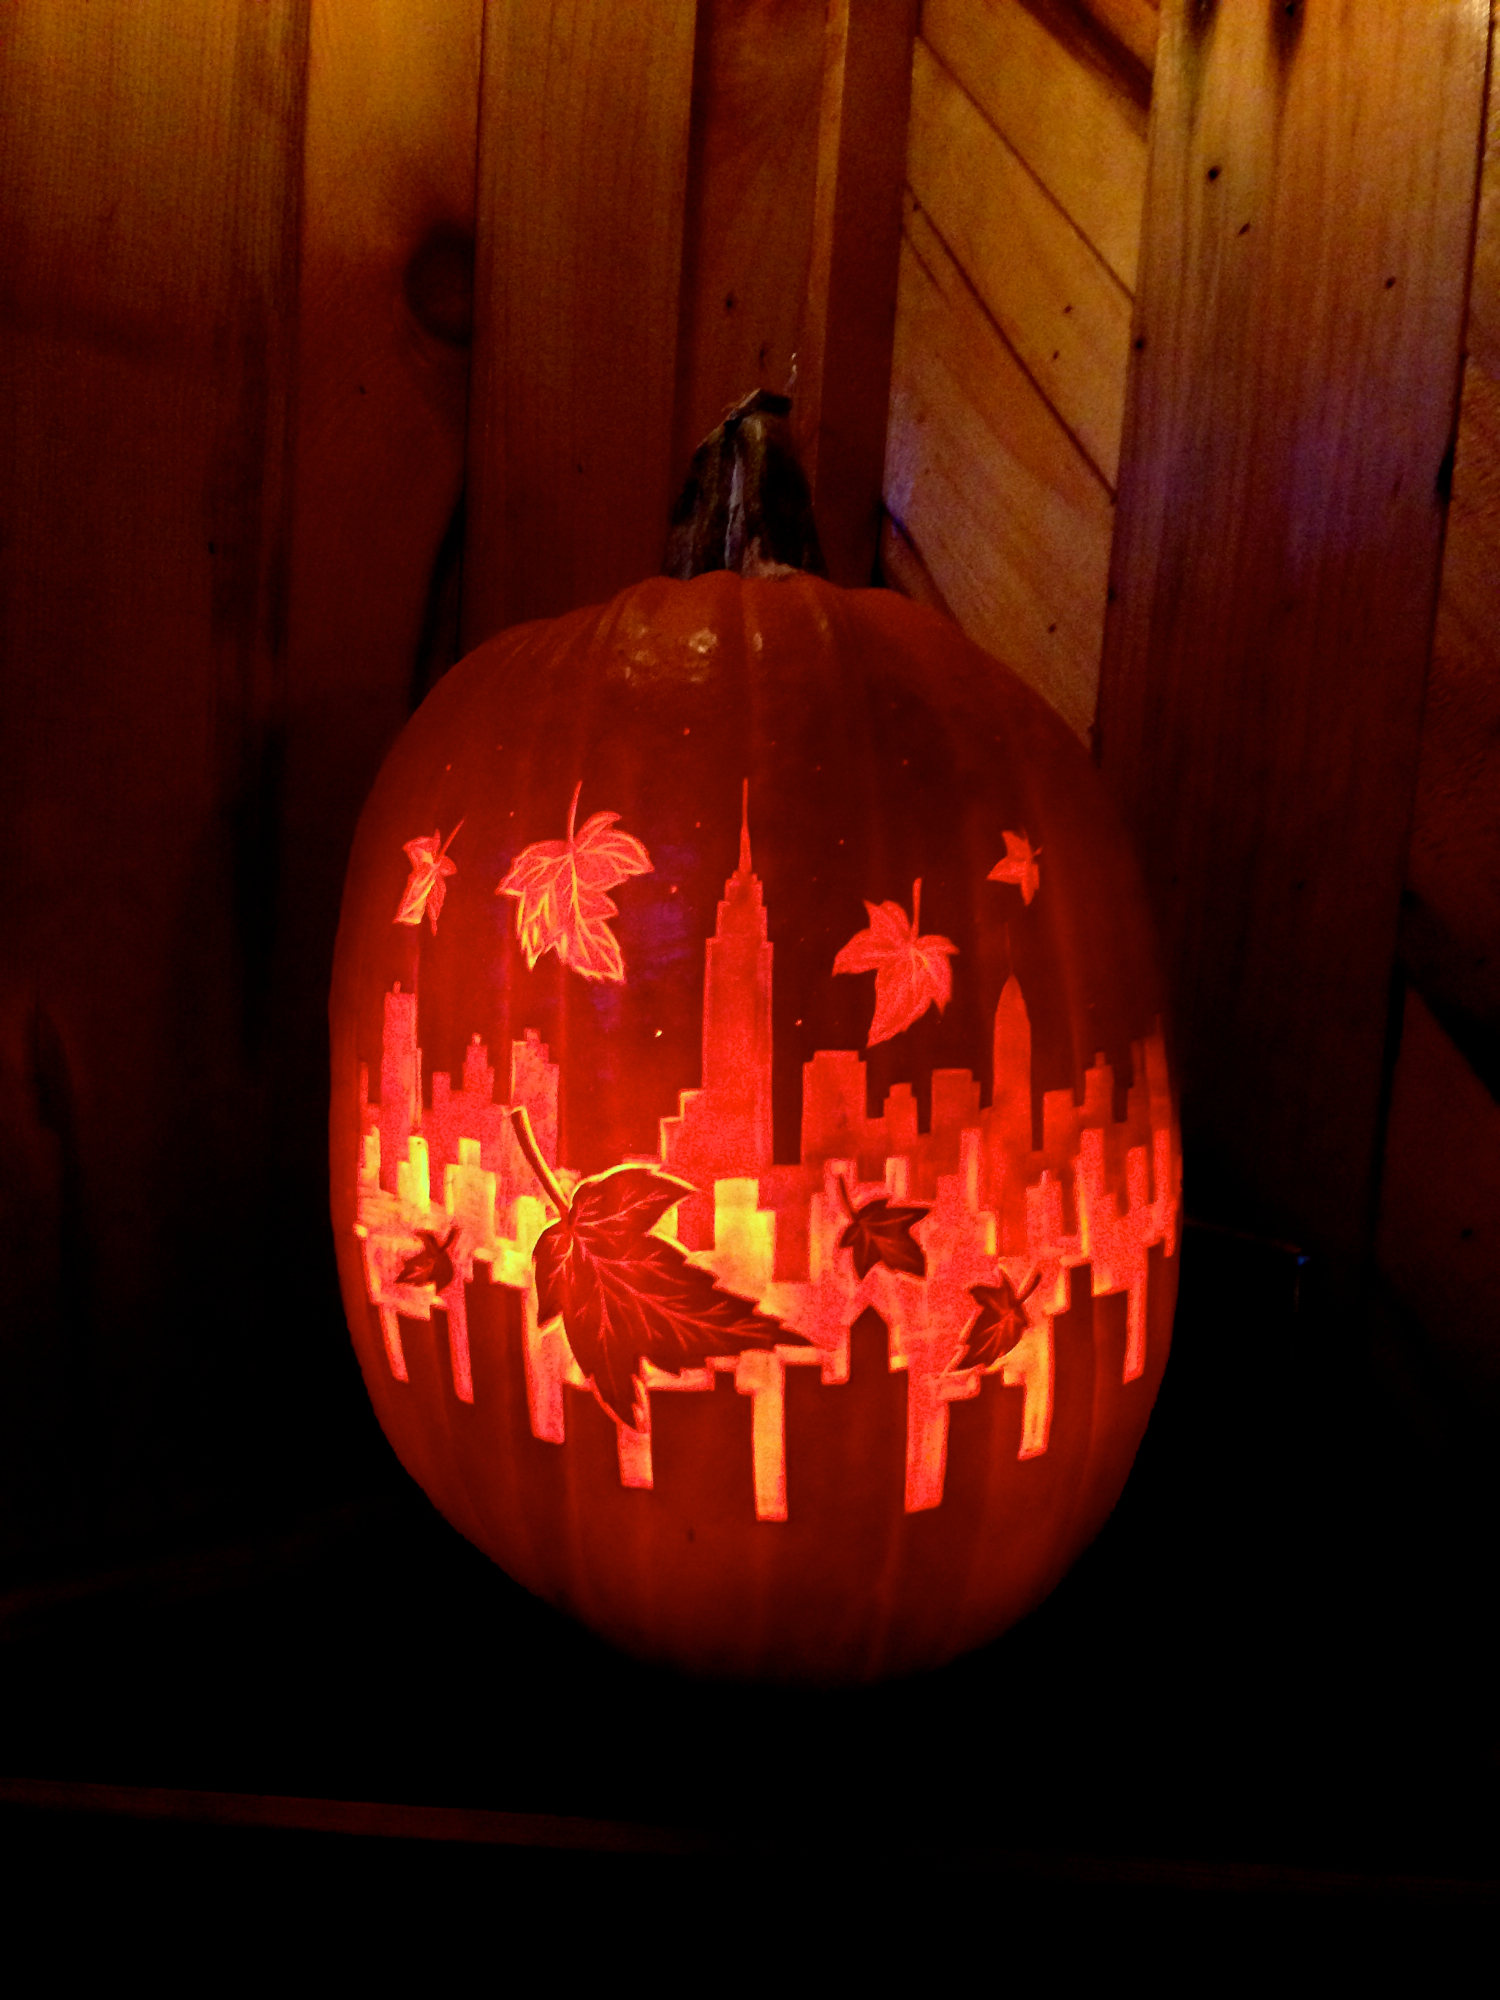 Maniac Pumpkin Carvers Professional Pumpkin Carving